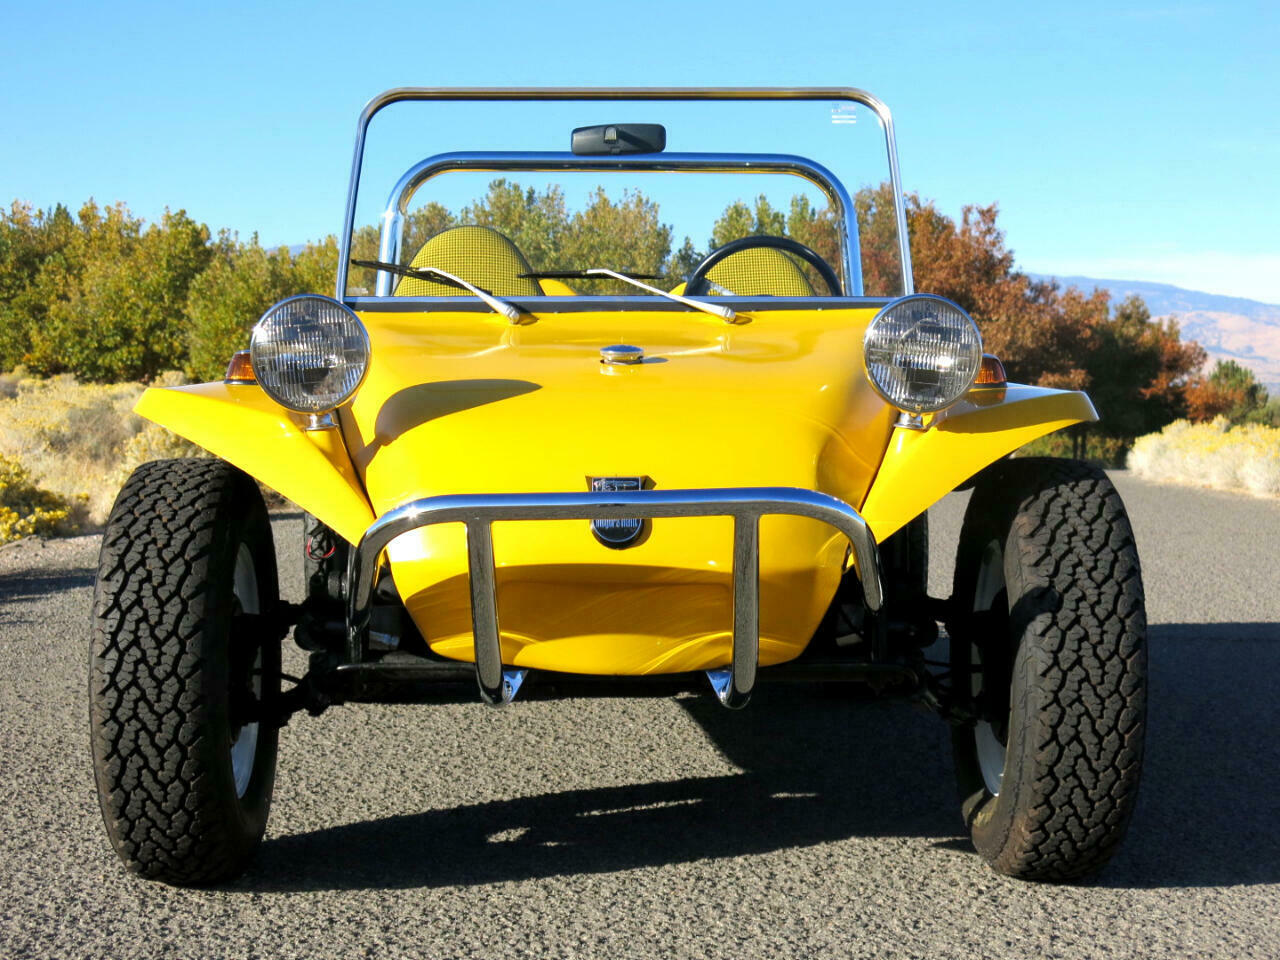 The Original American Dune Buggy - 1965 Meyers Manxter 2+2